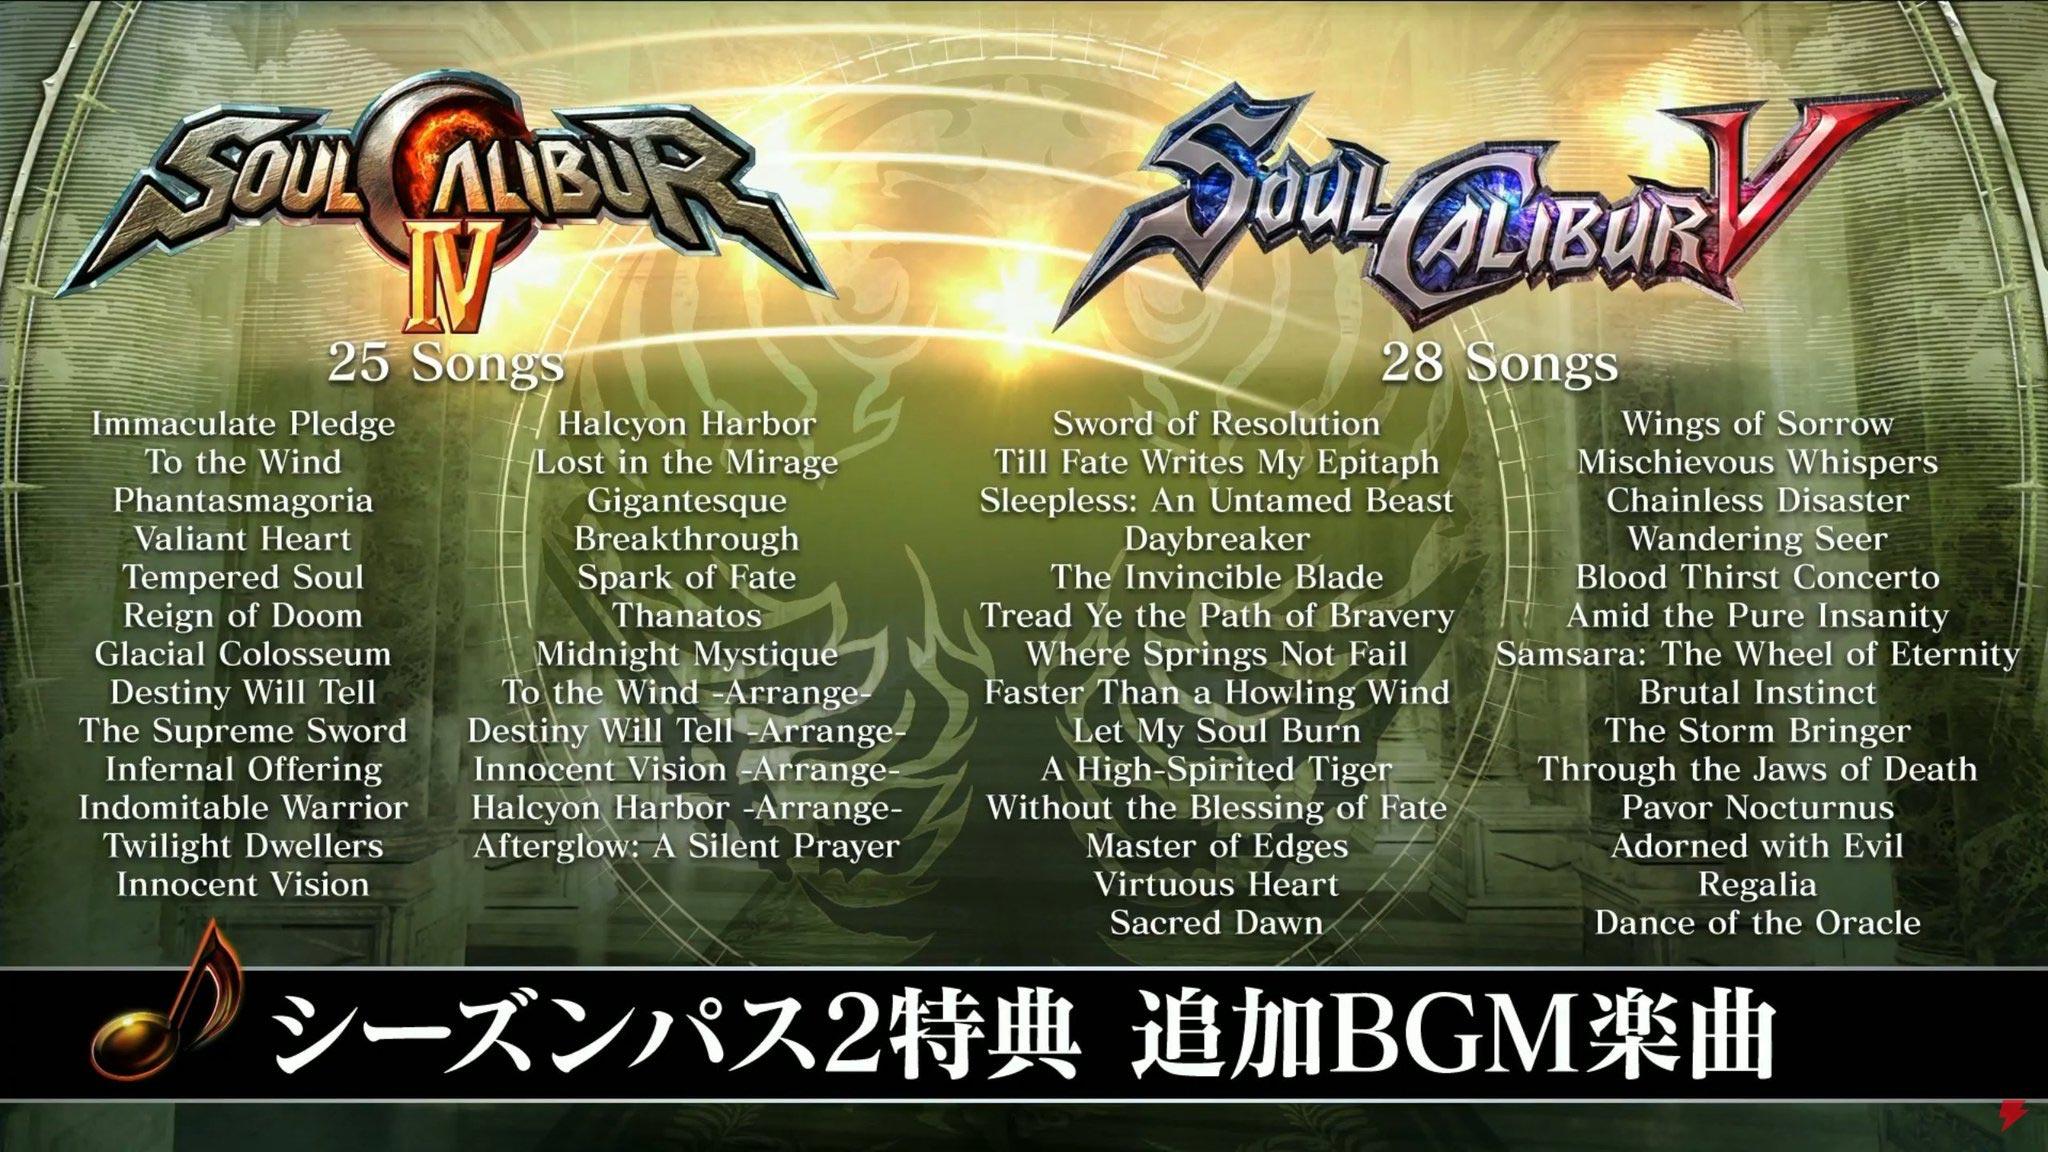 Soul Calibur Season 2 1 out of 2 image gallery